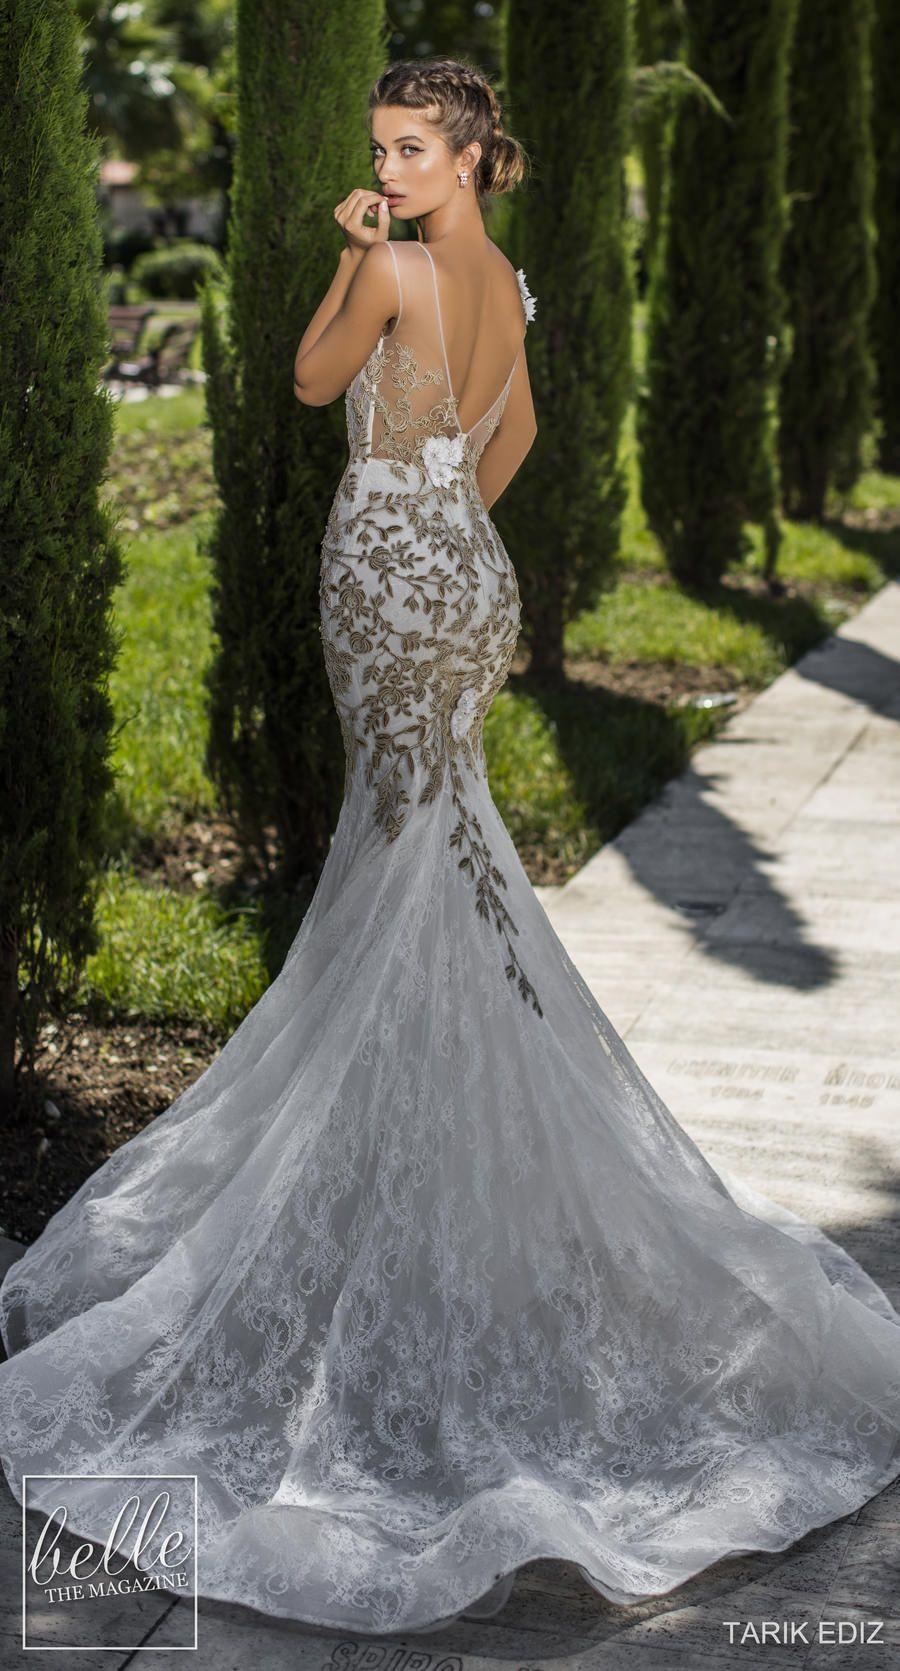 Tarik Ediz Wedding Dresses 2019 - The White Bridal Collection. Gold lace  mermaid sexy wedding backless  weddingdress  weddingdresses  bridalgown   bridal ... 34e35635dc05